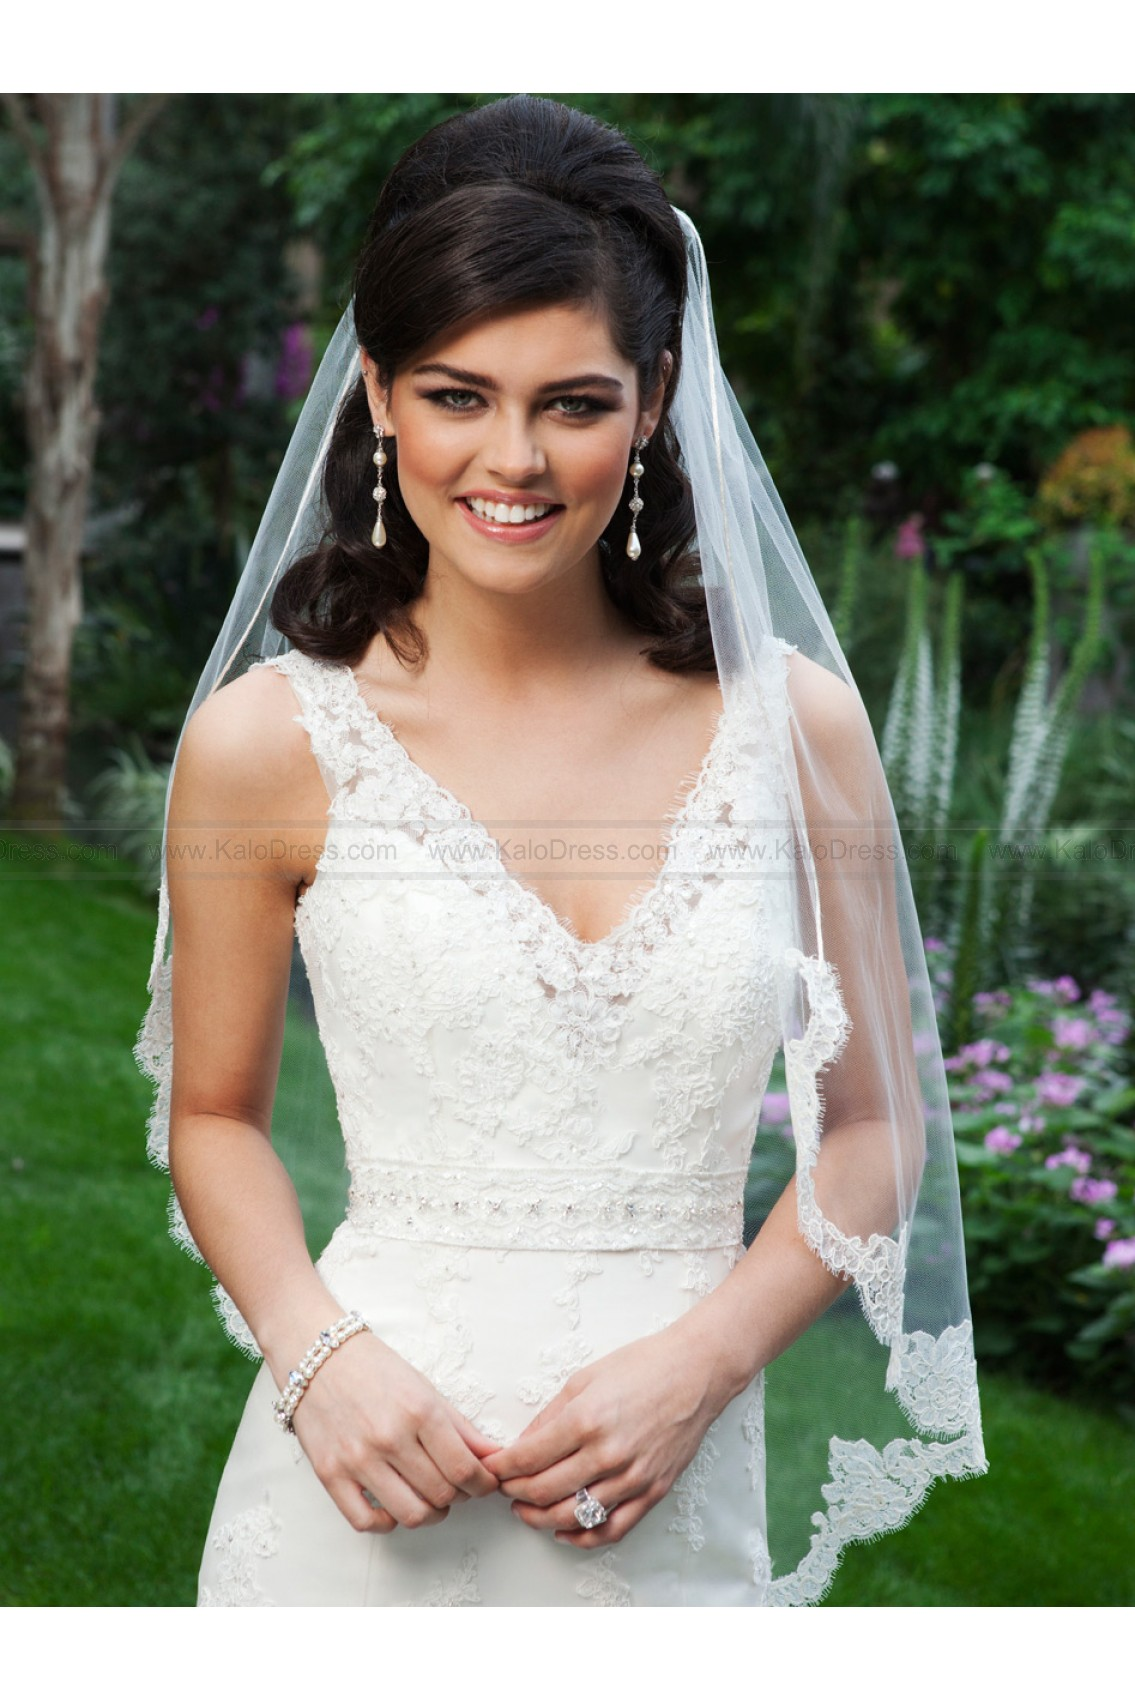 V-Neck Lace Accent Mermaid Bridal Dress by Sincerity 3735 - Beach Wedding Dresses - Informal Wedding Dresses